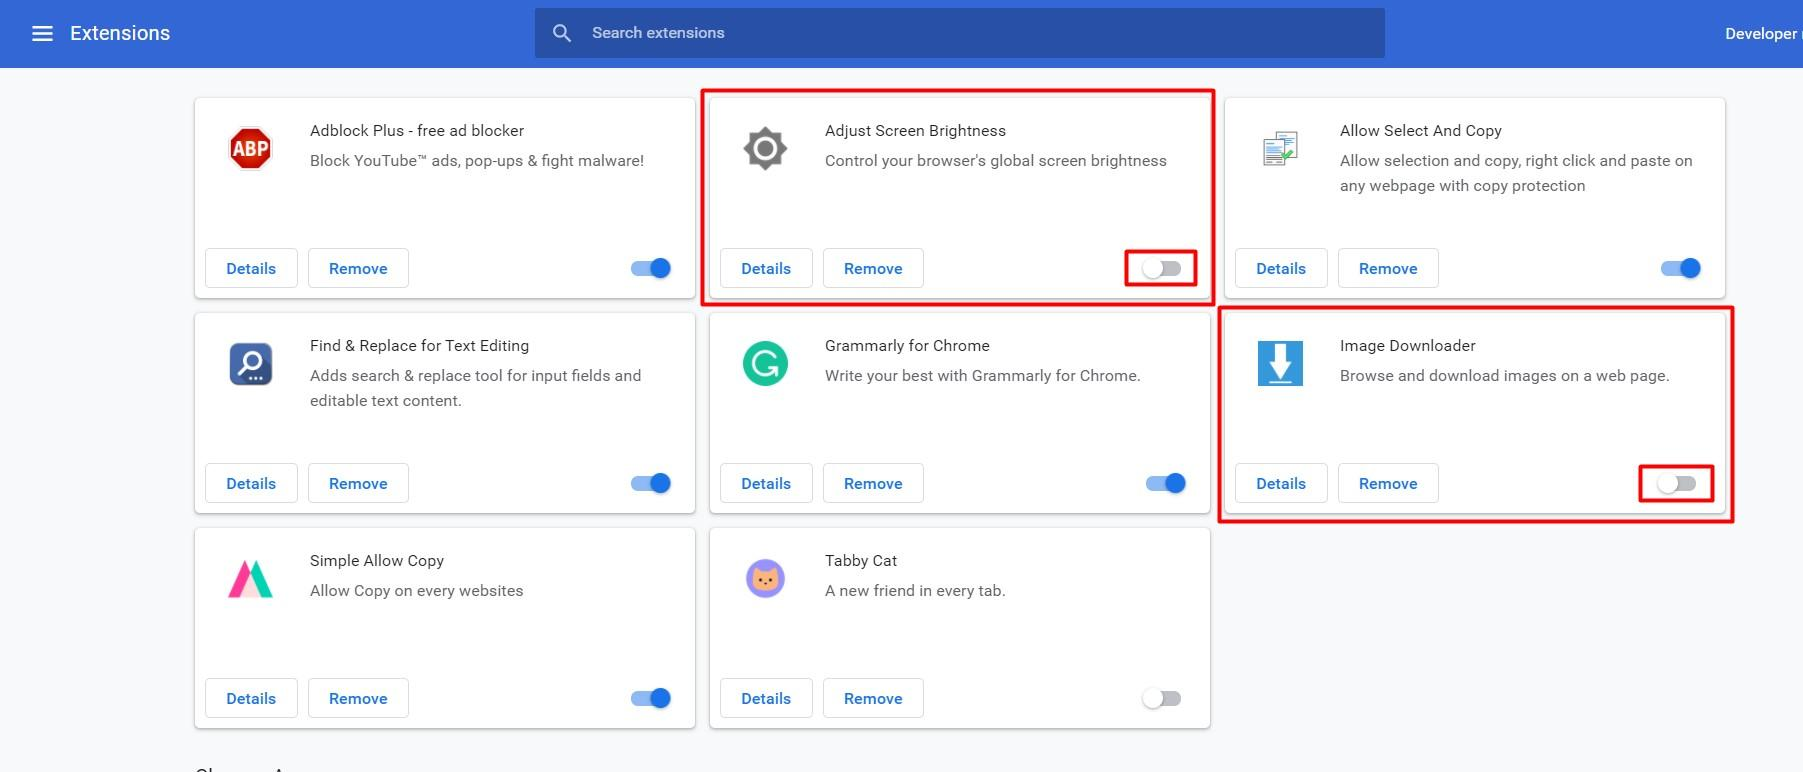 Temporary Disable Google Chrome Extension